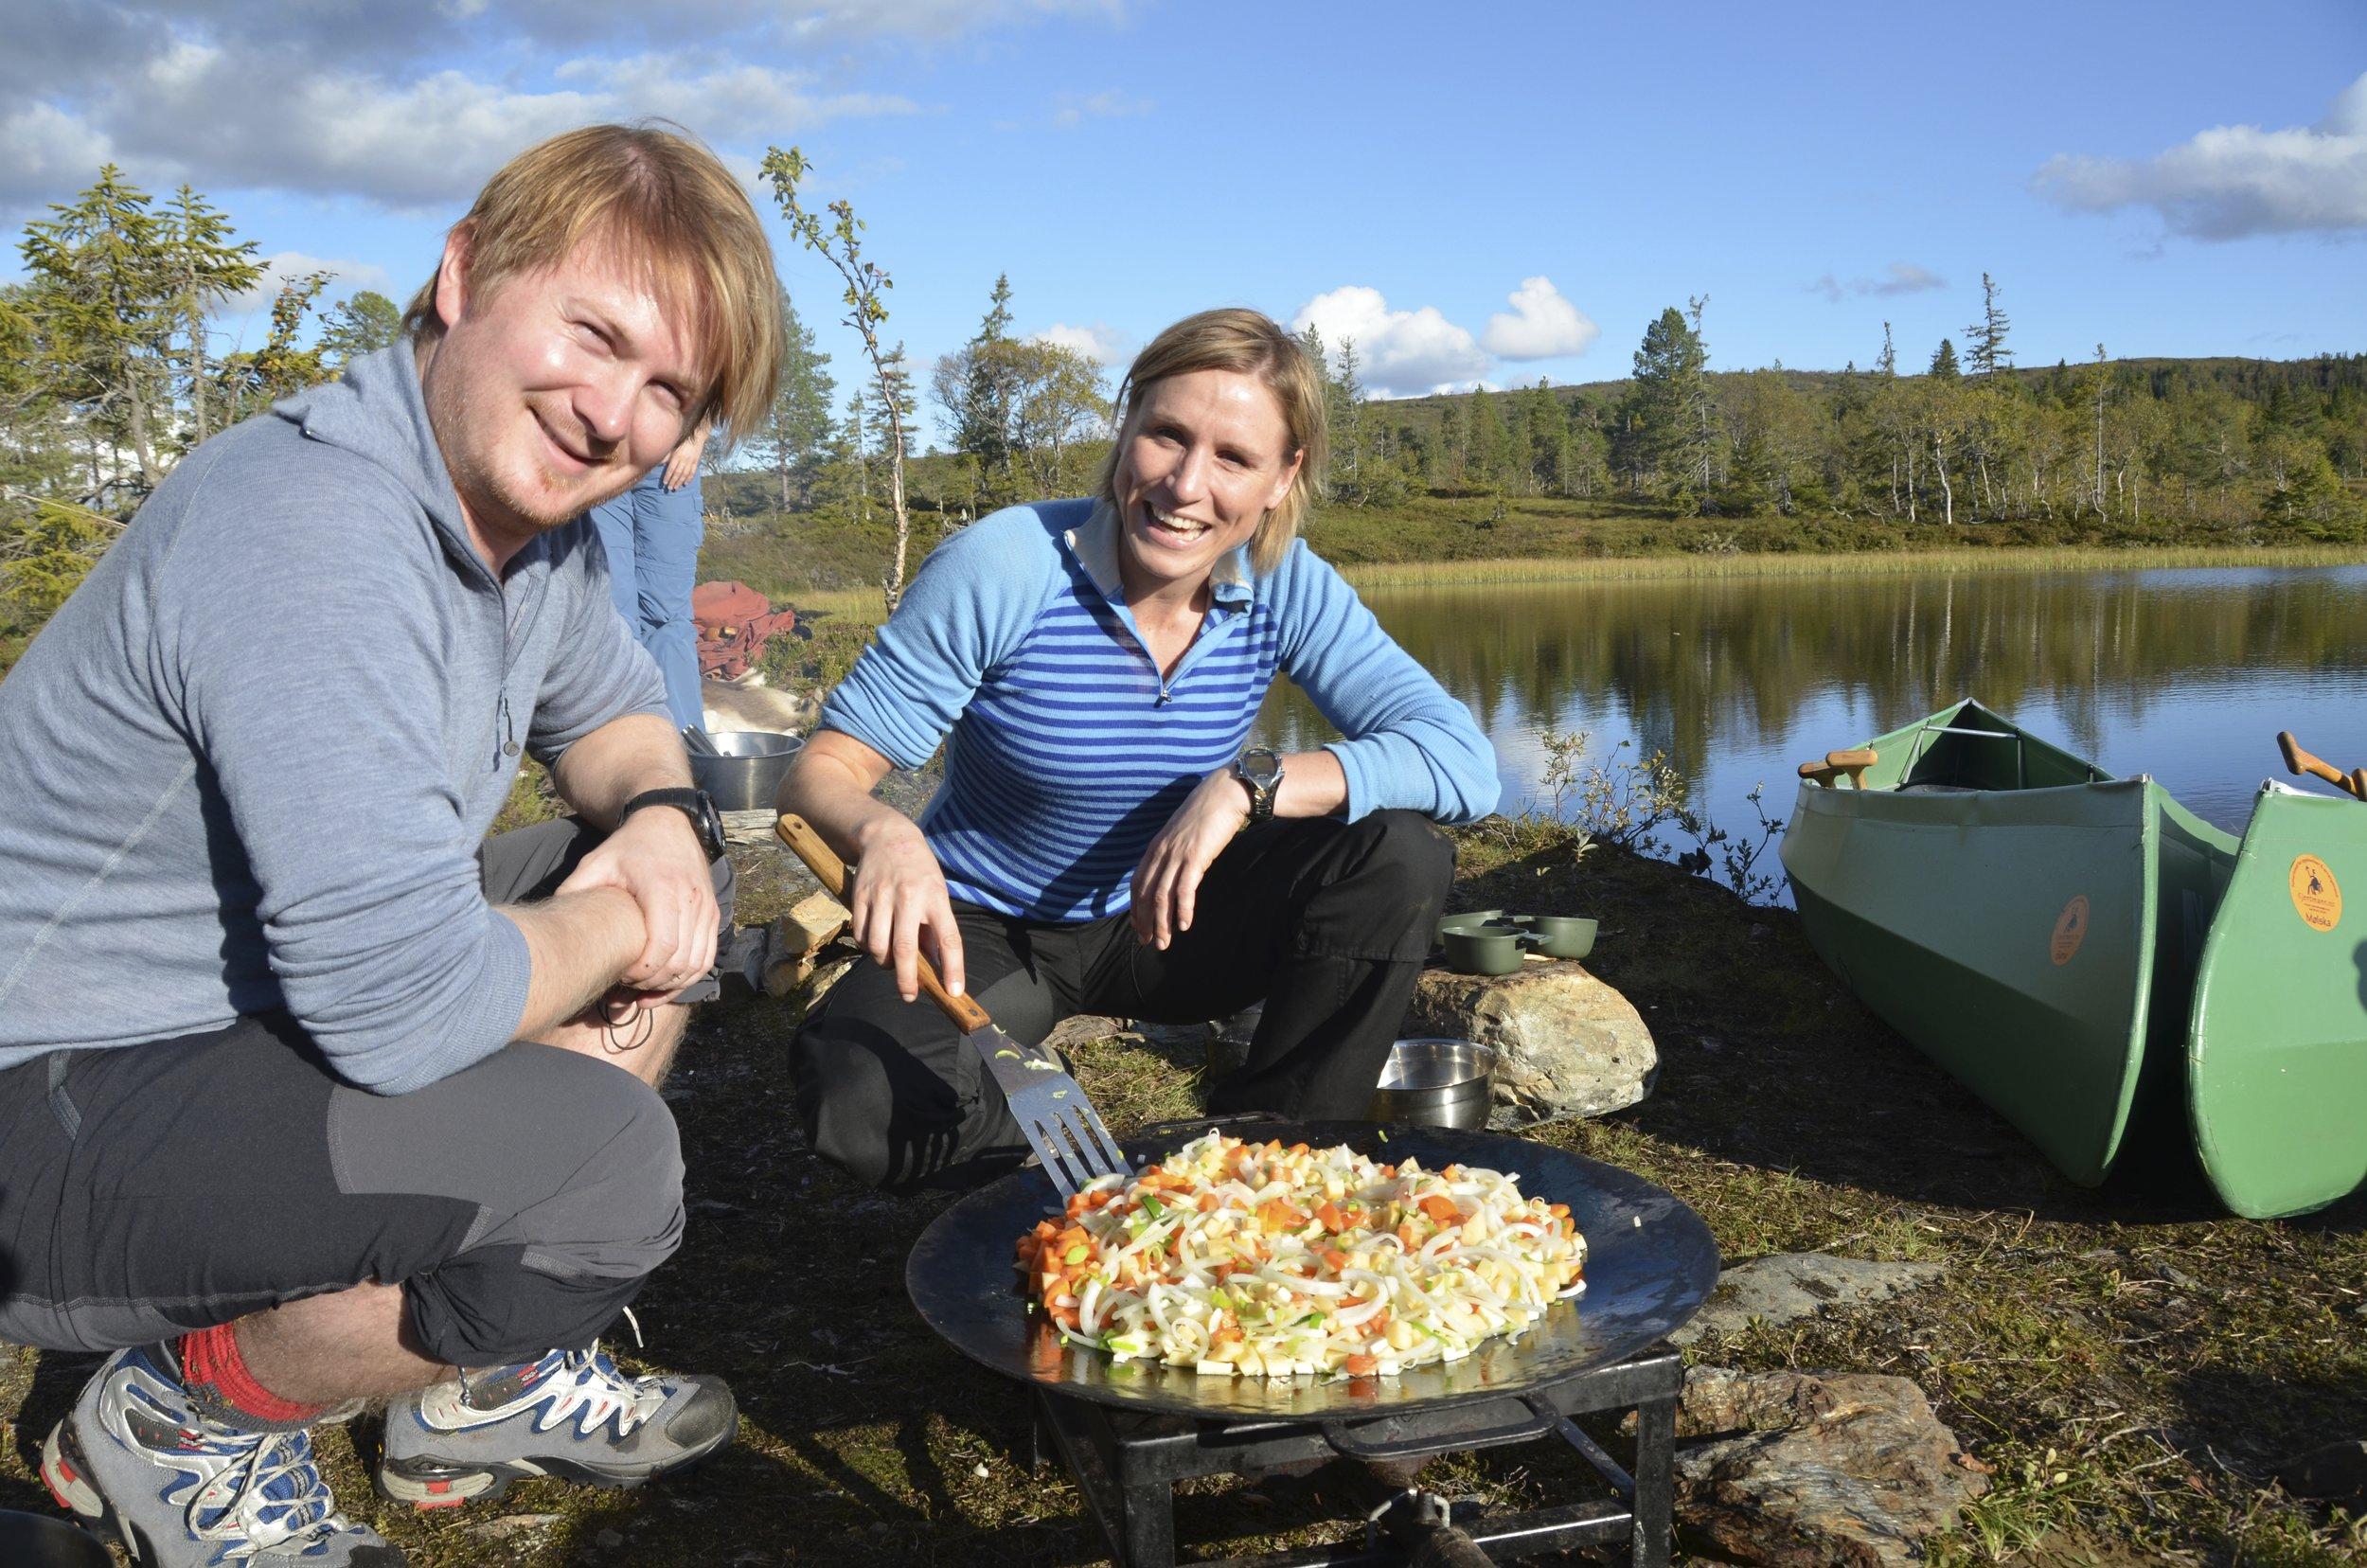 Preparing lunch (Photo: Petter Thorsen/Wild Norway)